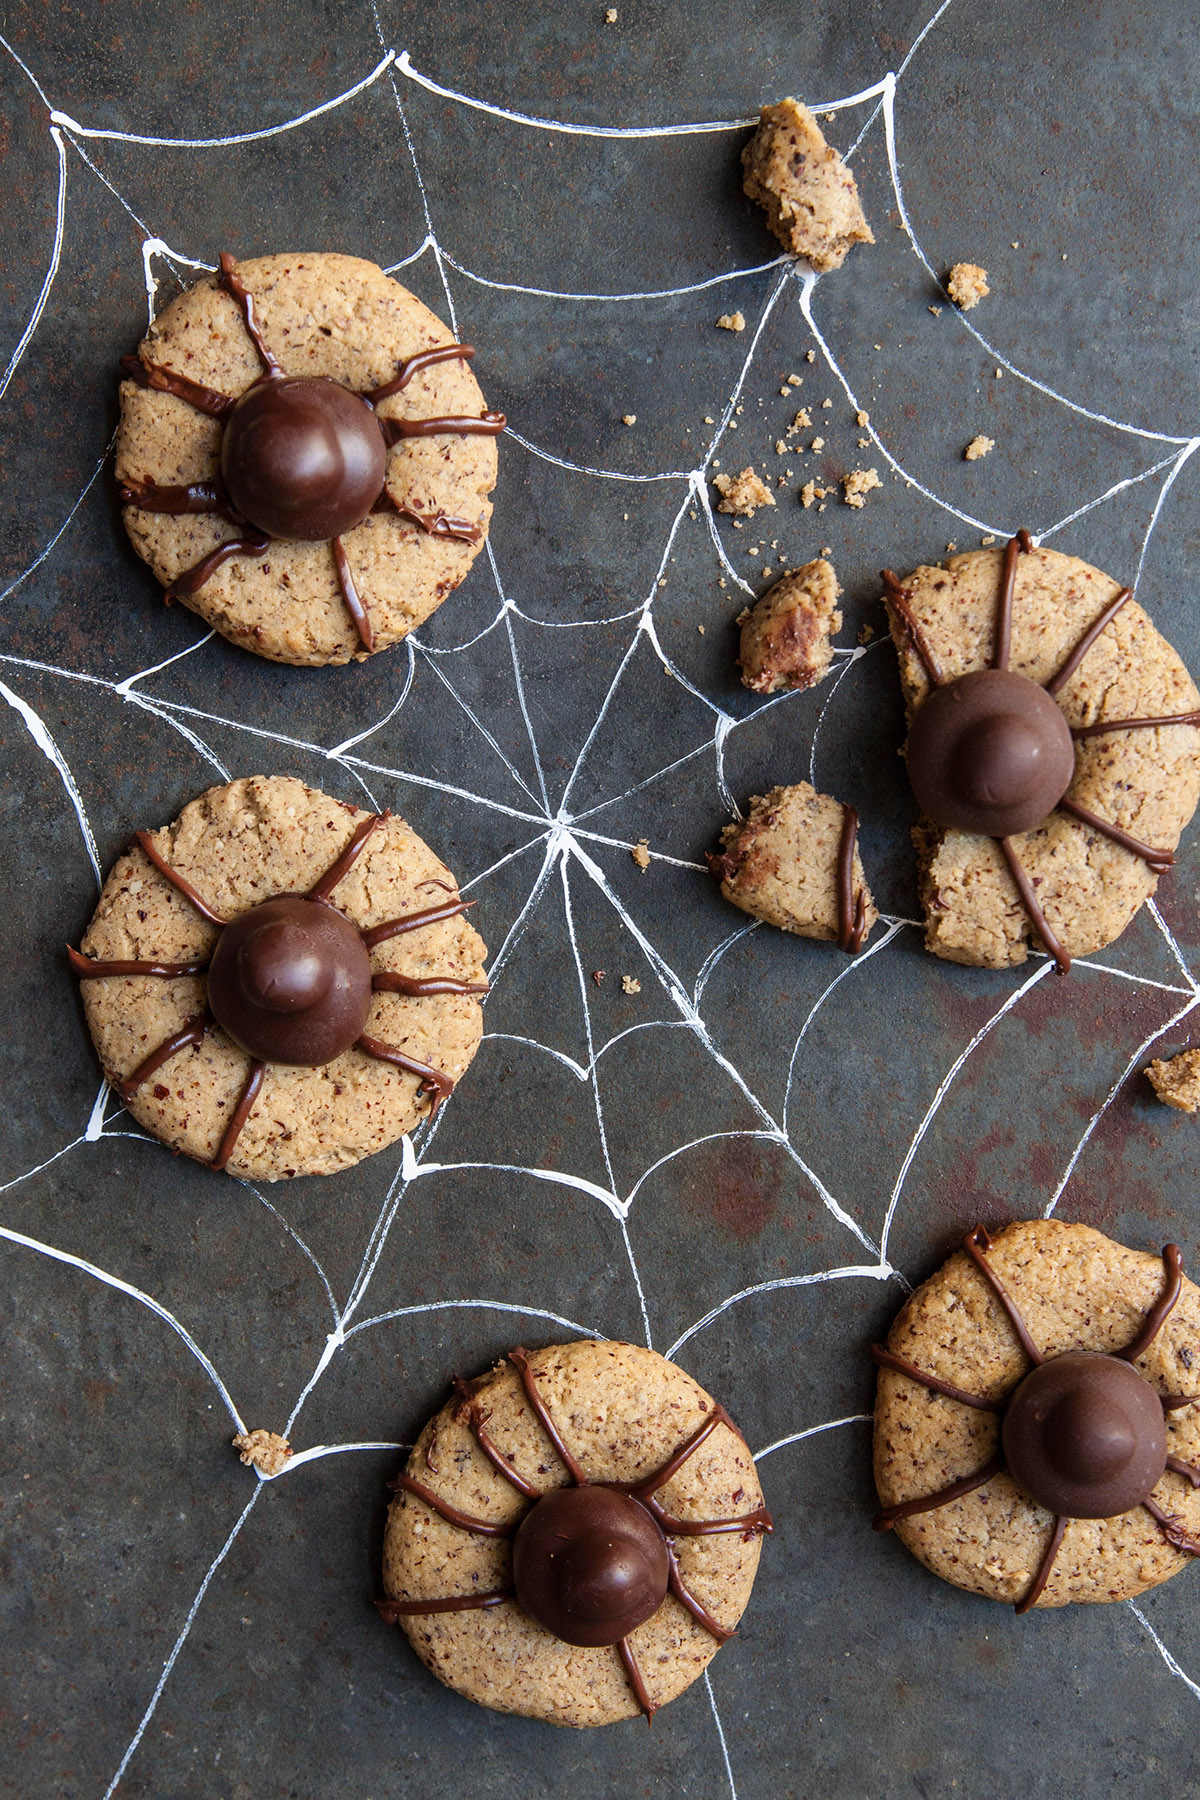 Spooky Spider Hazelnut Olive Oil Thumbprint Cookies